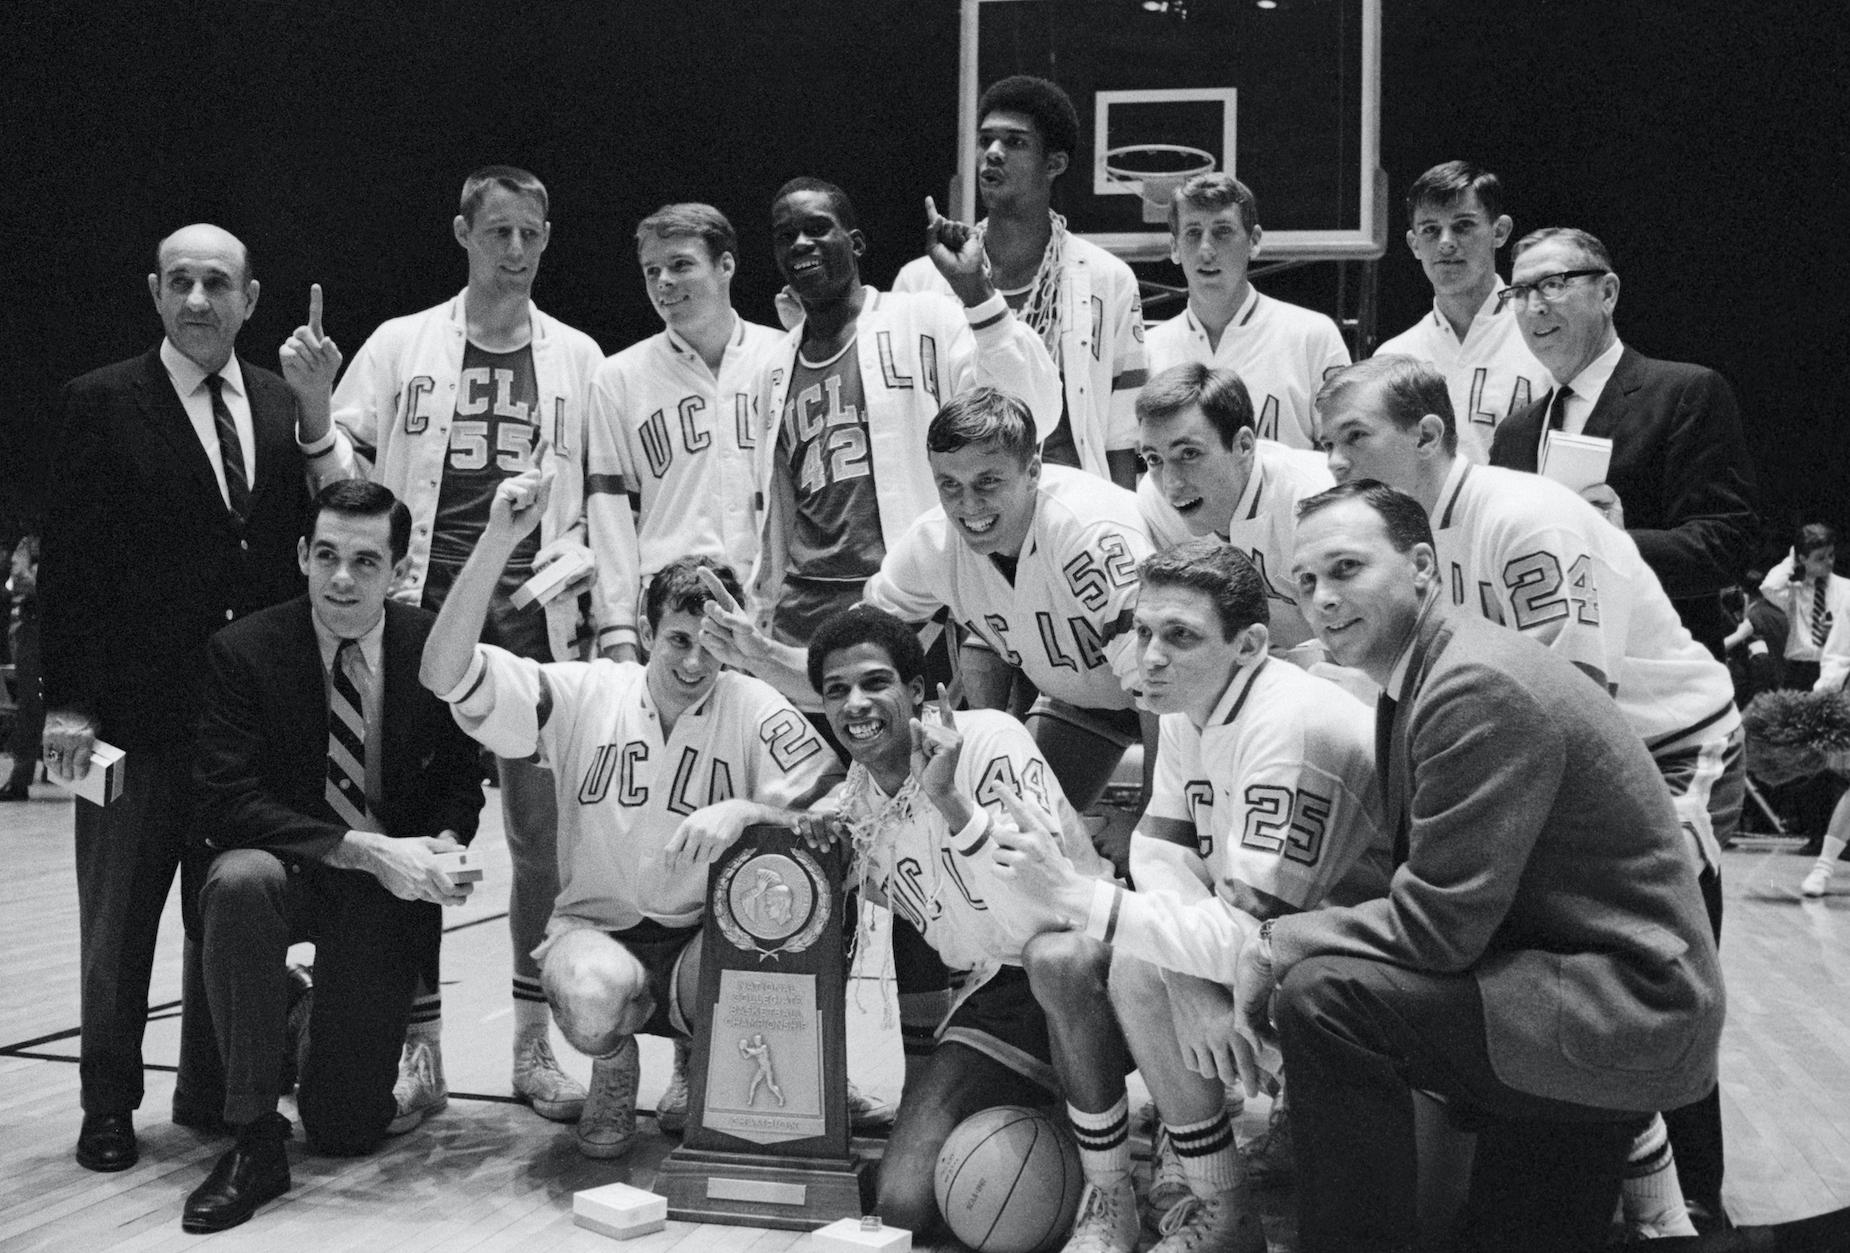 The UCLA Bruins men's basketball team celebrates winning the NCAA championship in 1967.